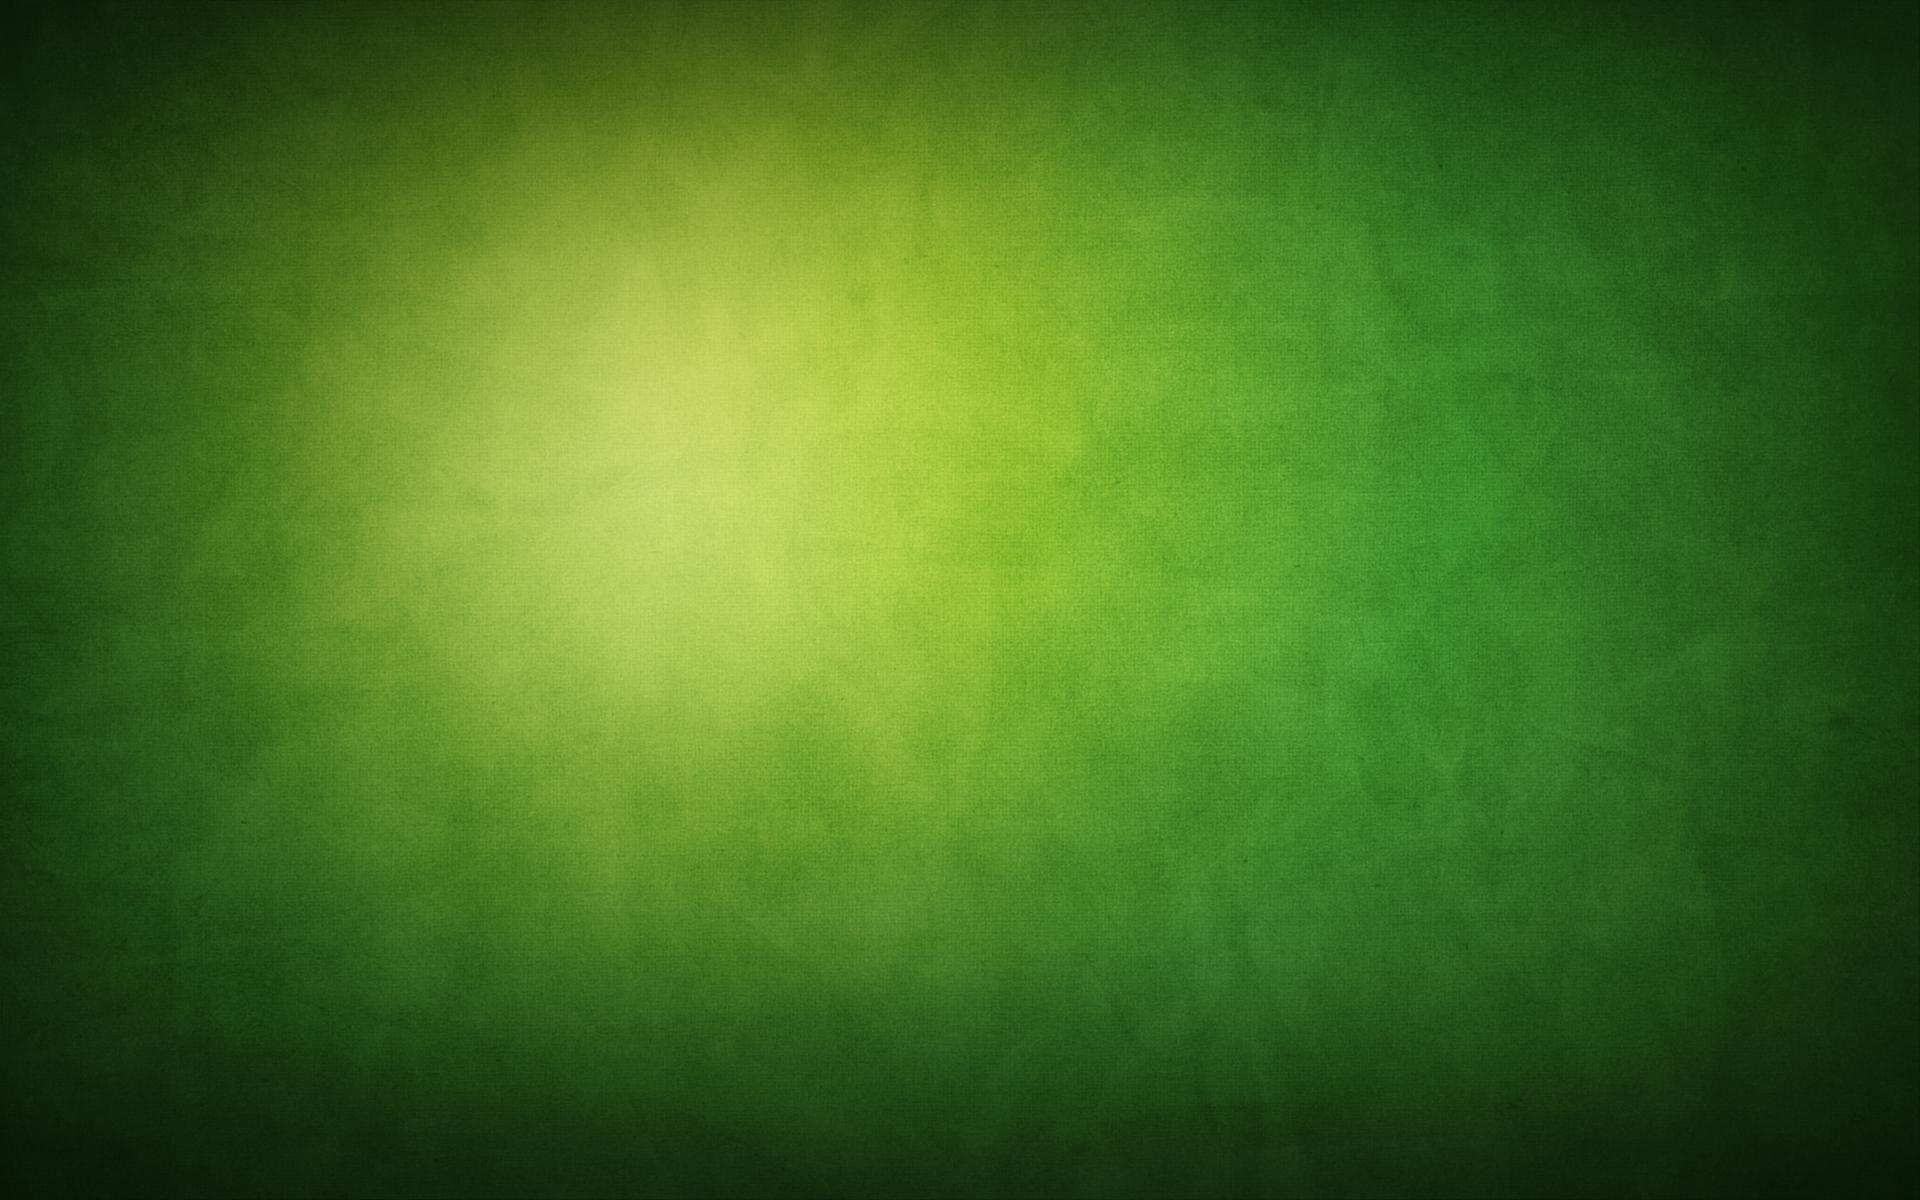 Green Background   Wallpaper 32816 1920x1200